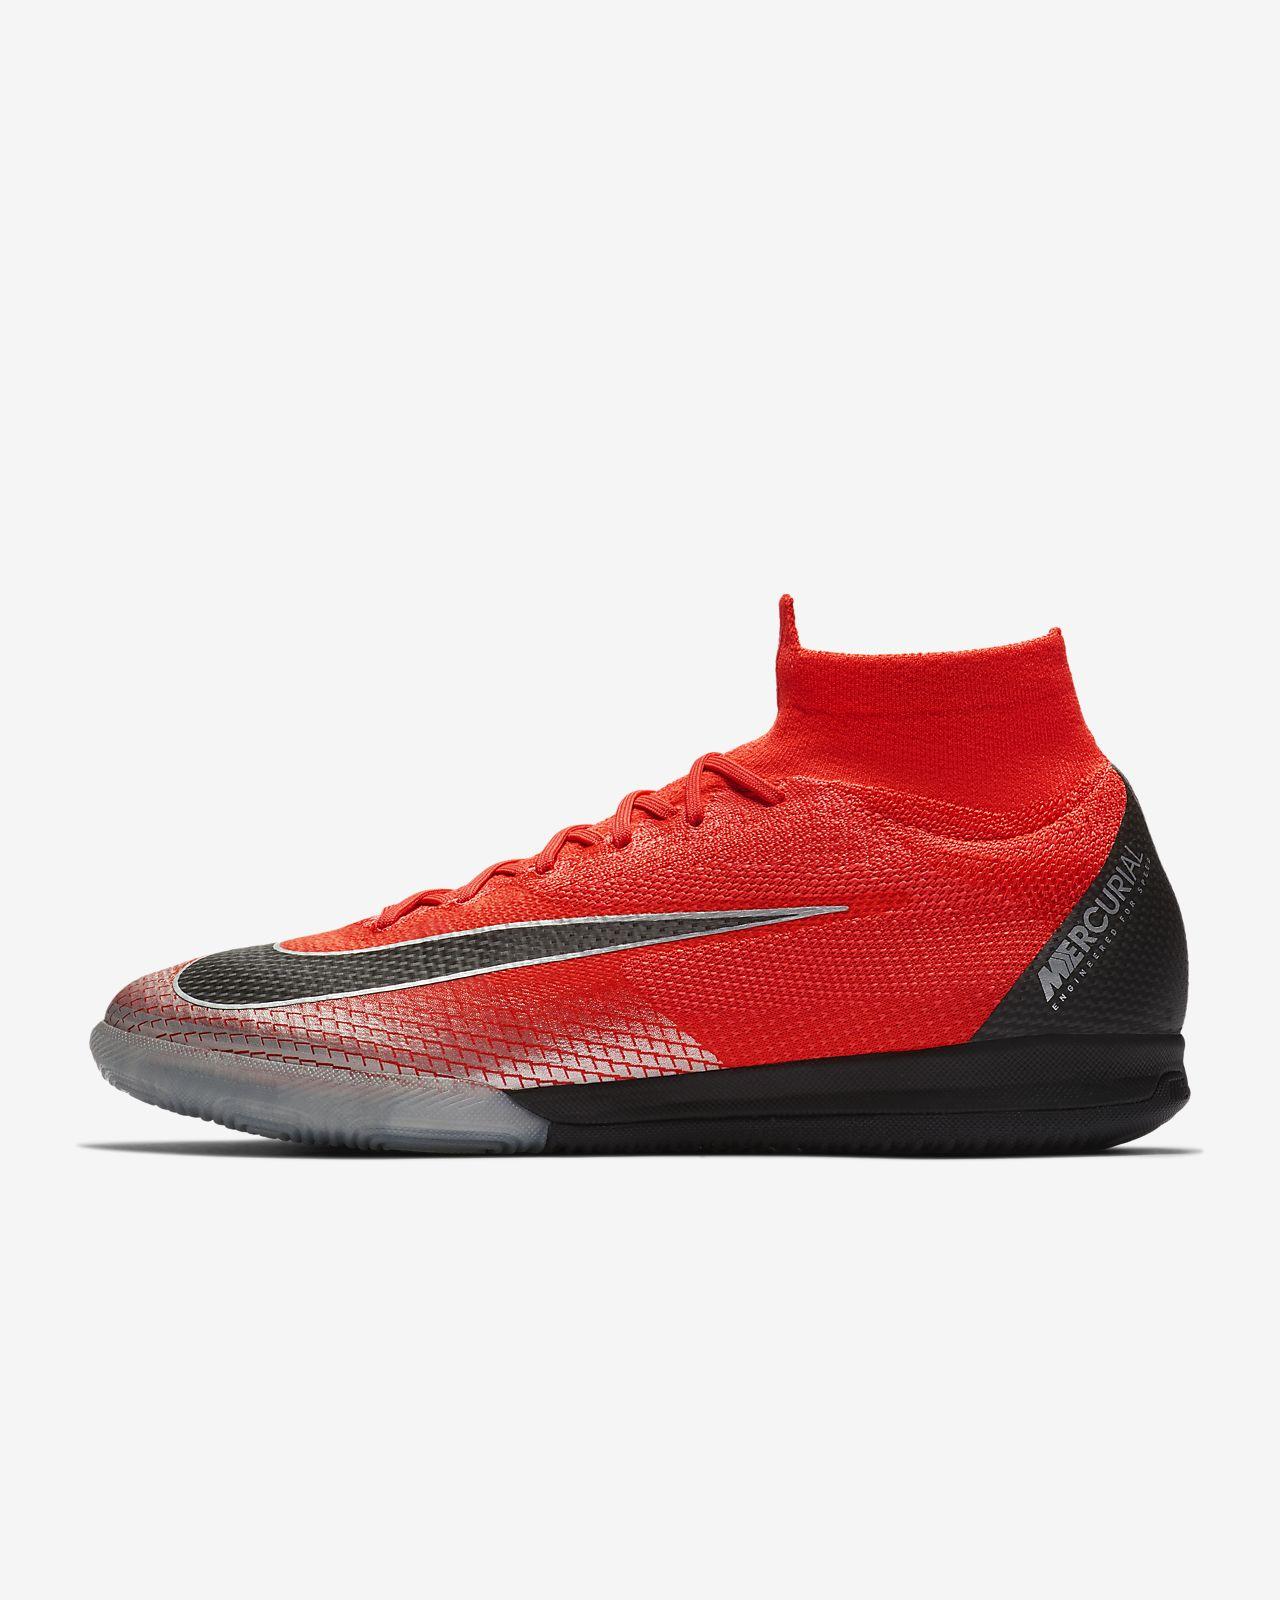 Nike SuperflyX 6 Elite LVL UP IC Indoor/Court Soccer Shoe